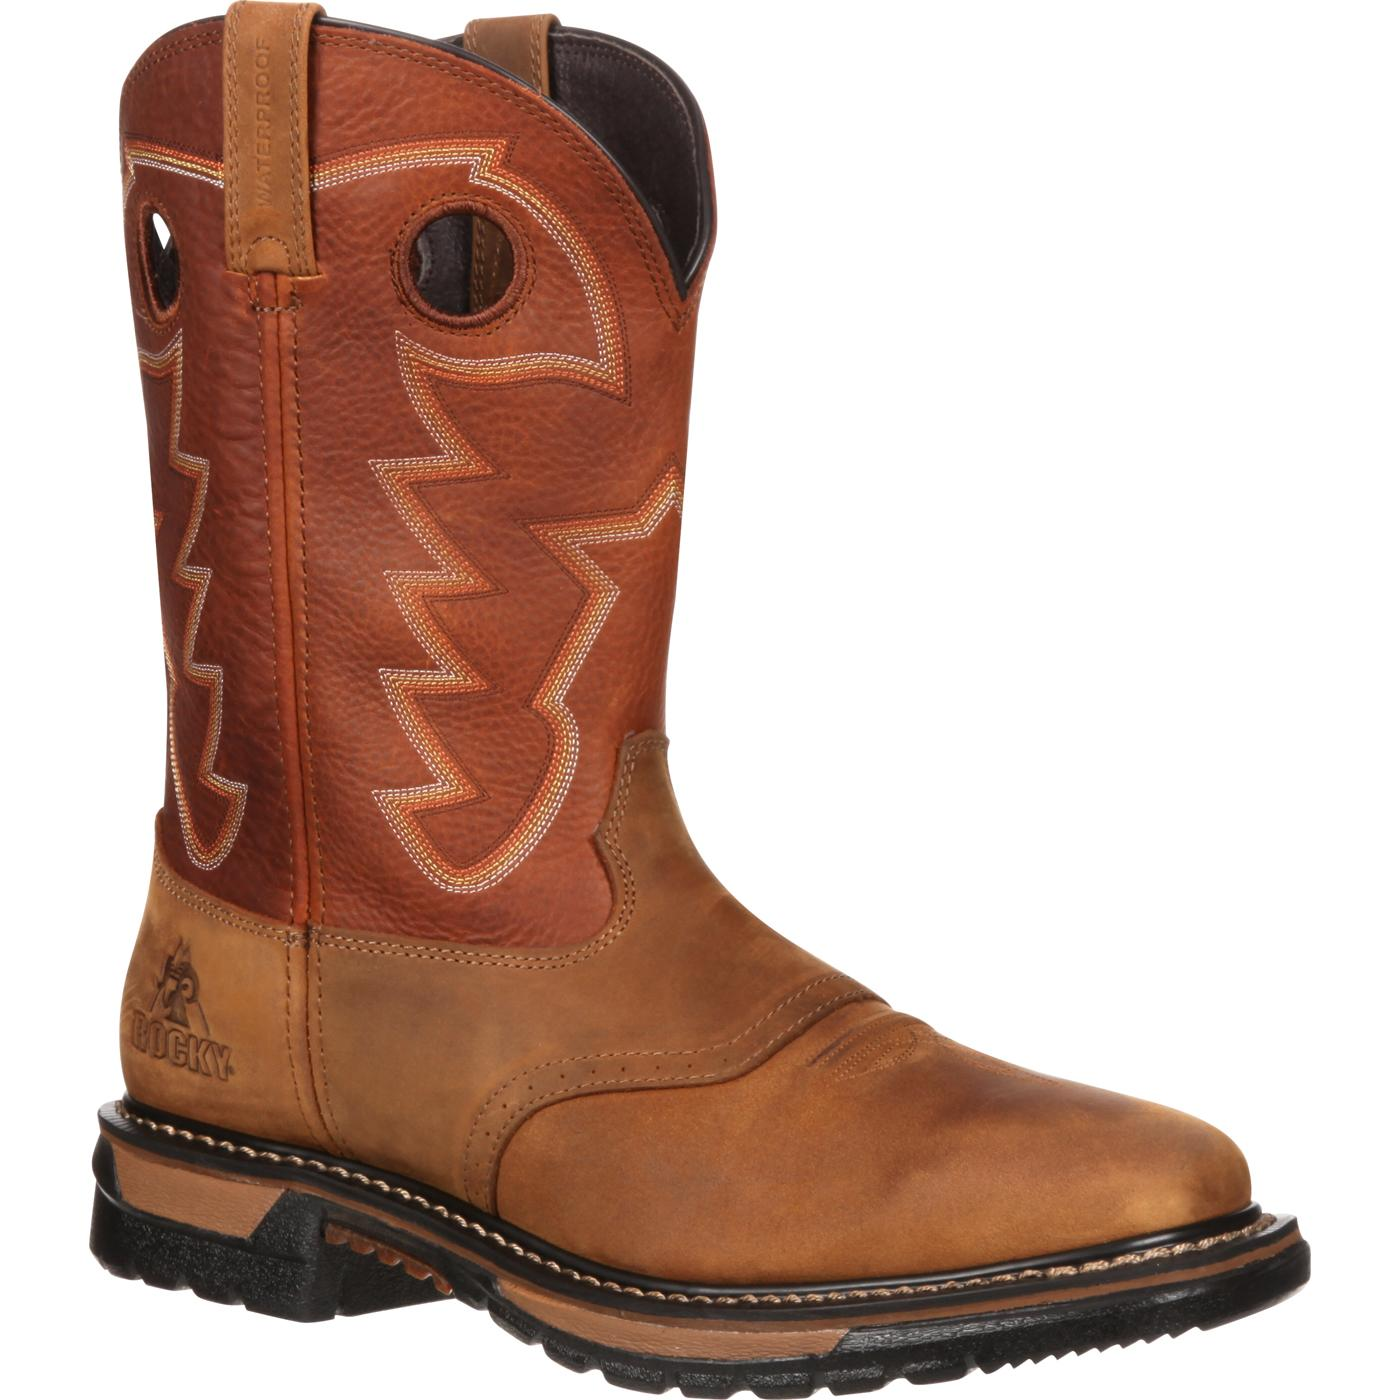 rocky boots rocky original ride waterproof western boot, , large utkvxcv